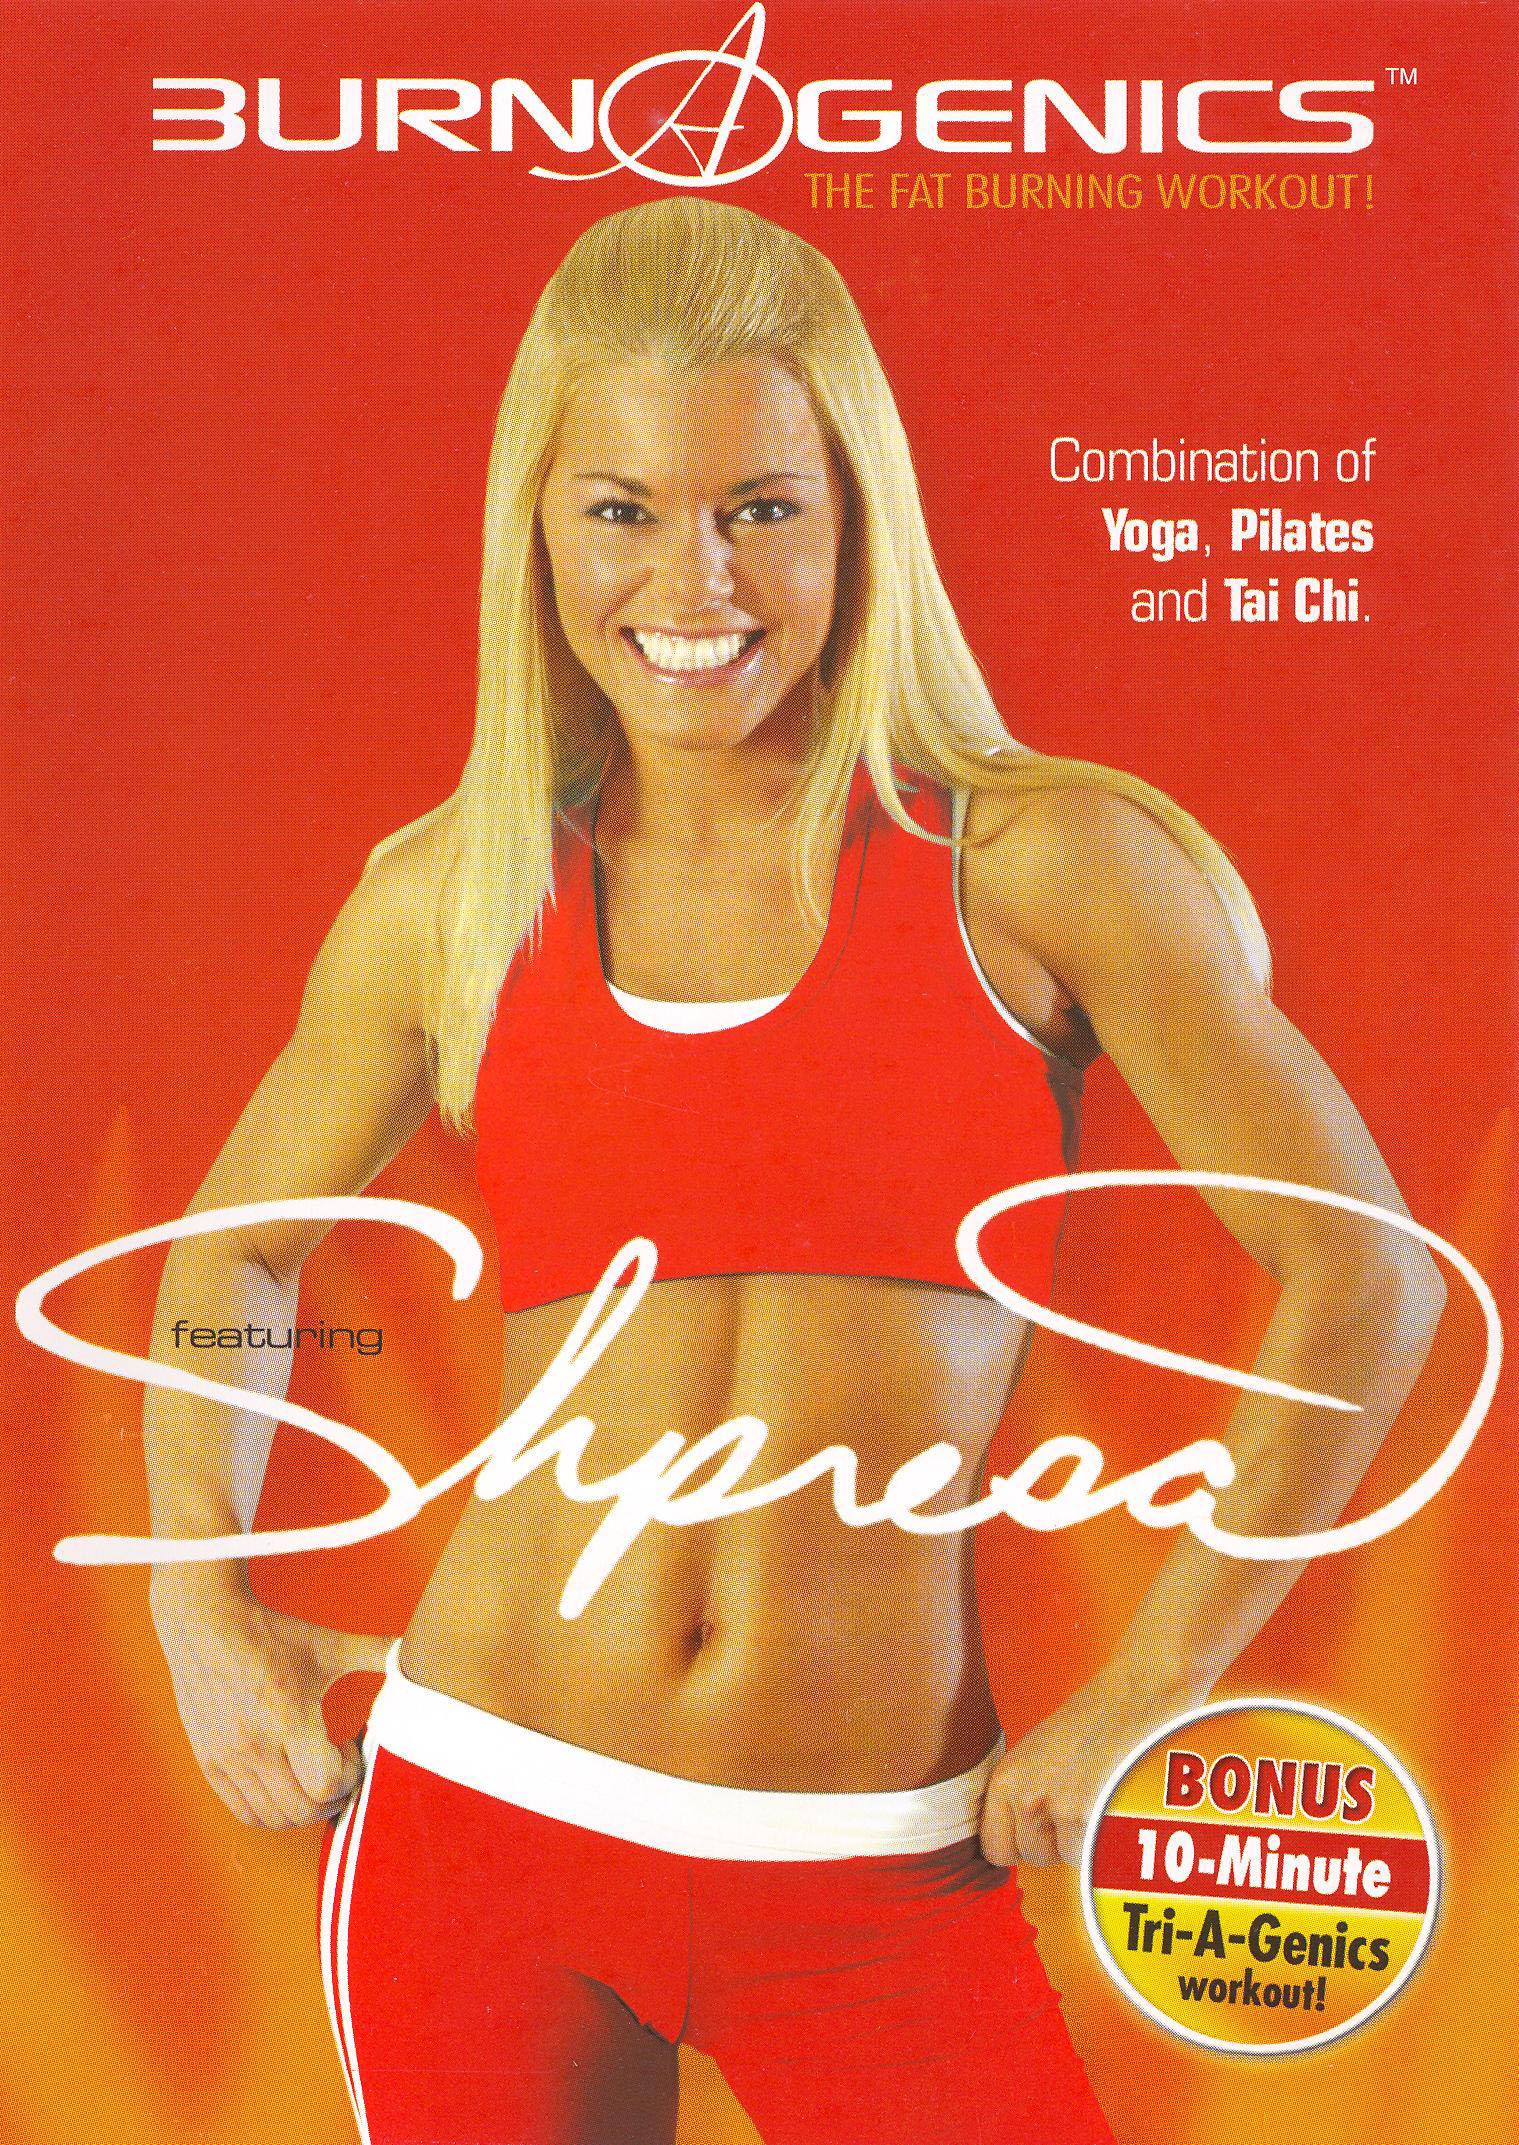 Burn-a-Genics: The Fat Burning Workout!